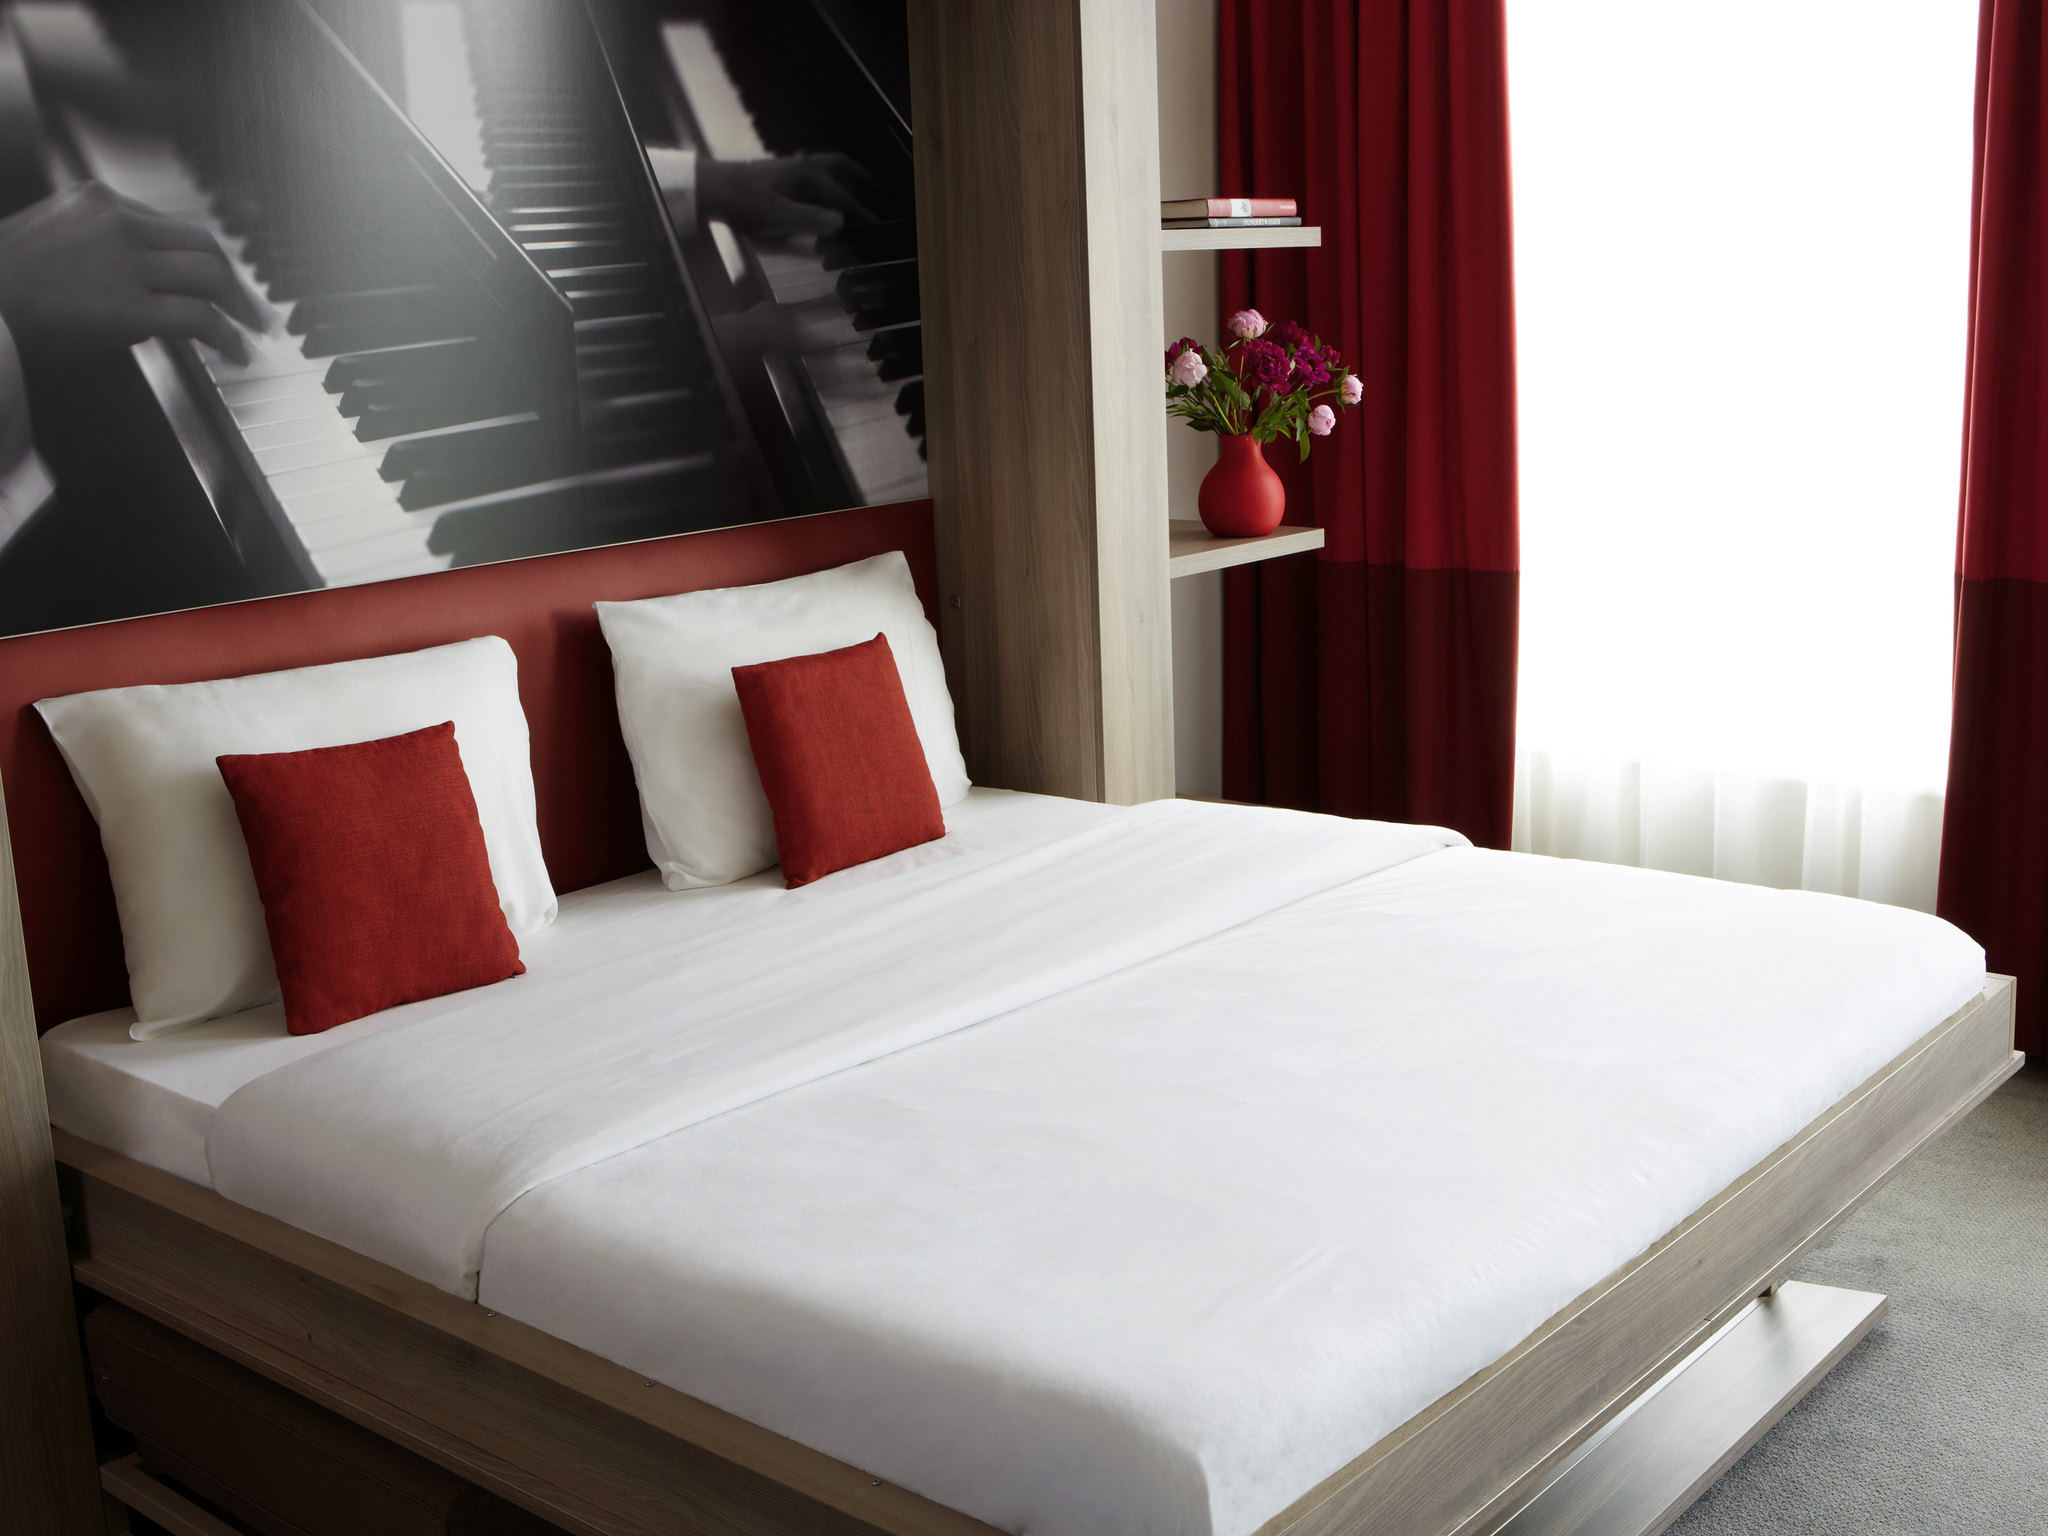 Hotel w mie cie wiede aparthotel adagio wien zentrum for Aparthotel adagio espagne